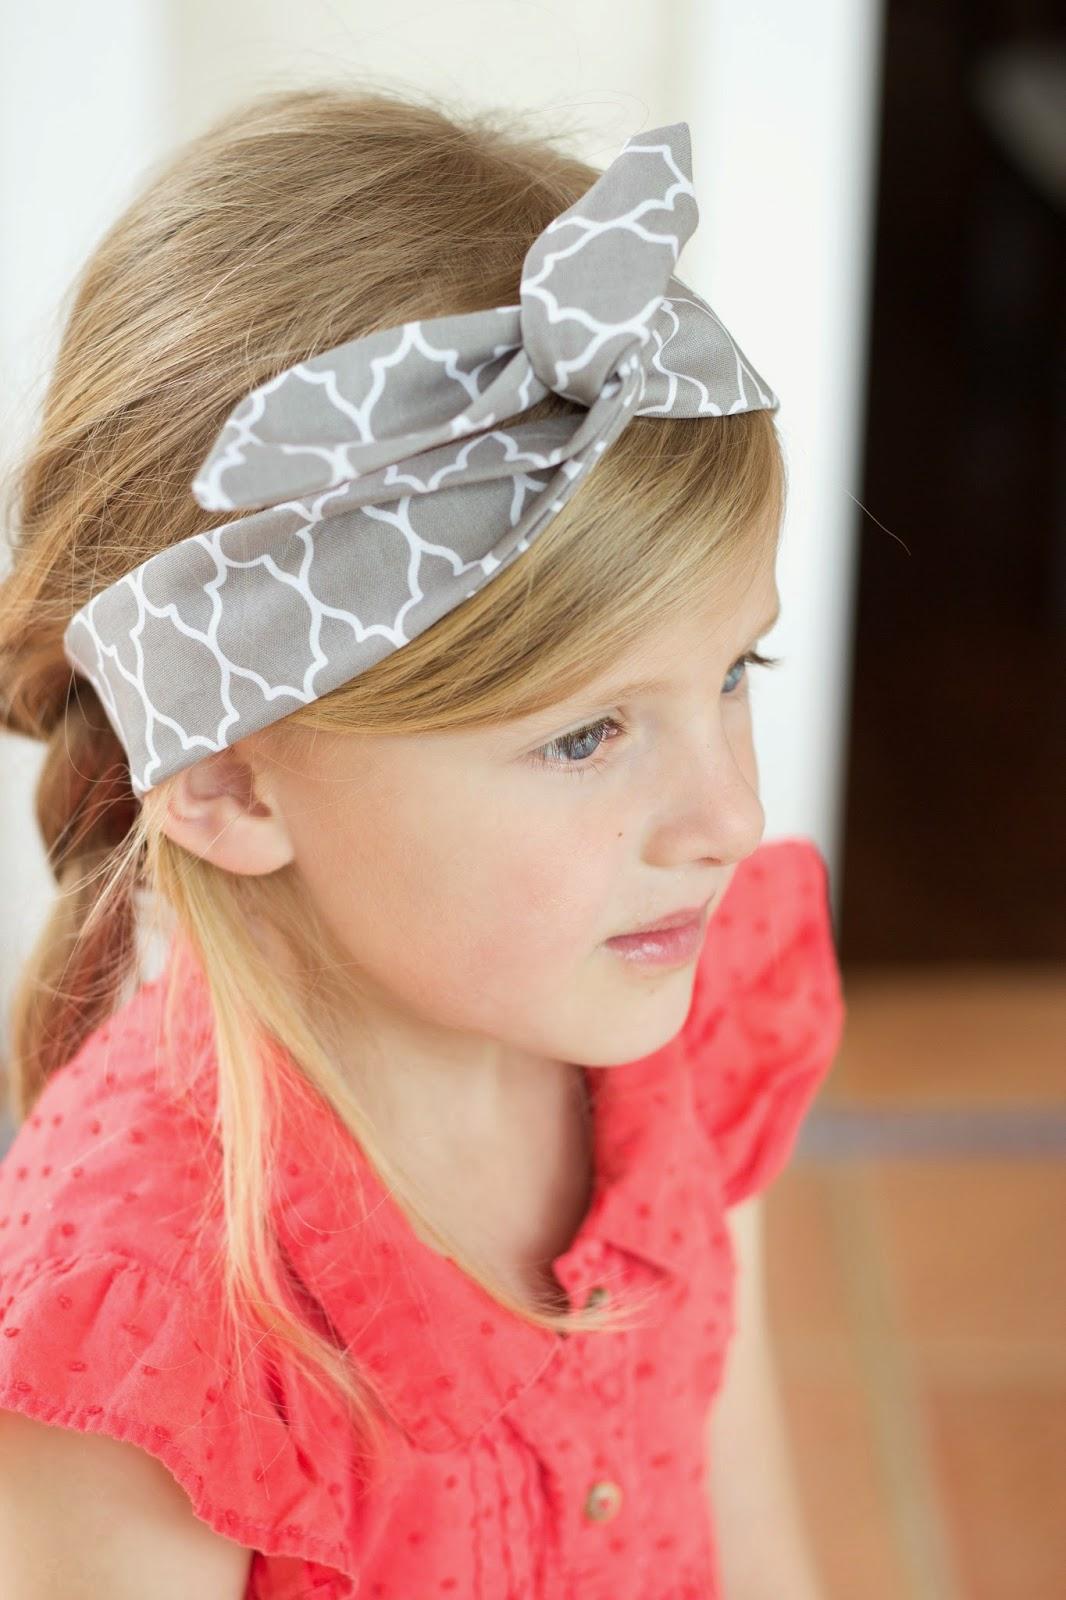 do it yourself divas  DIY Wire Headband - Wire Hair Bow 3c078caad6a